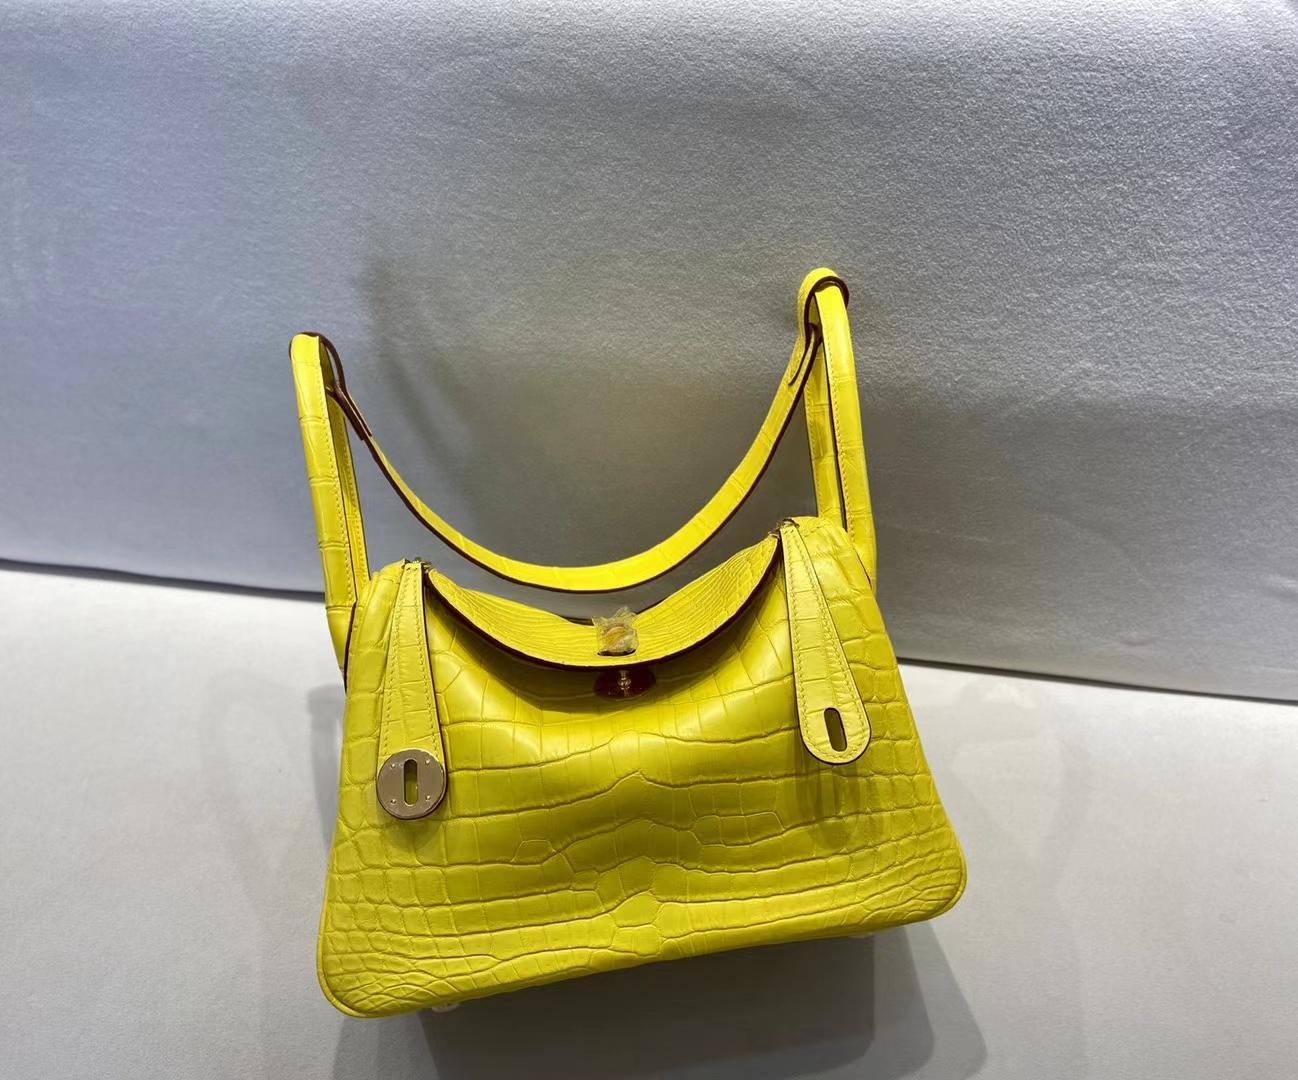 Hermès(爱马仕)Lindy 26cm 金扣 雾面鳄鱼 M9金盏花黄 顶级纯手工